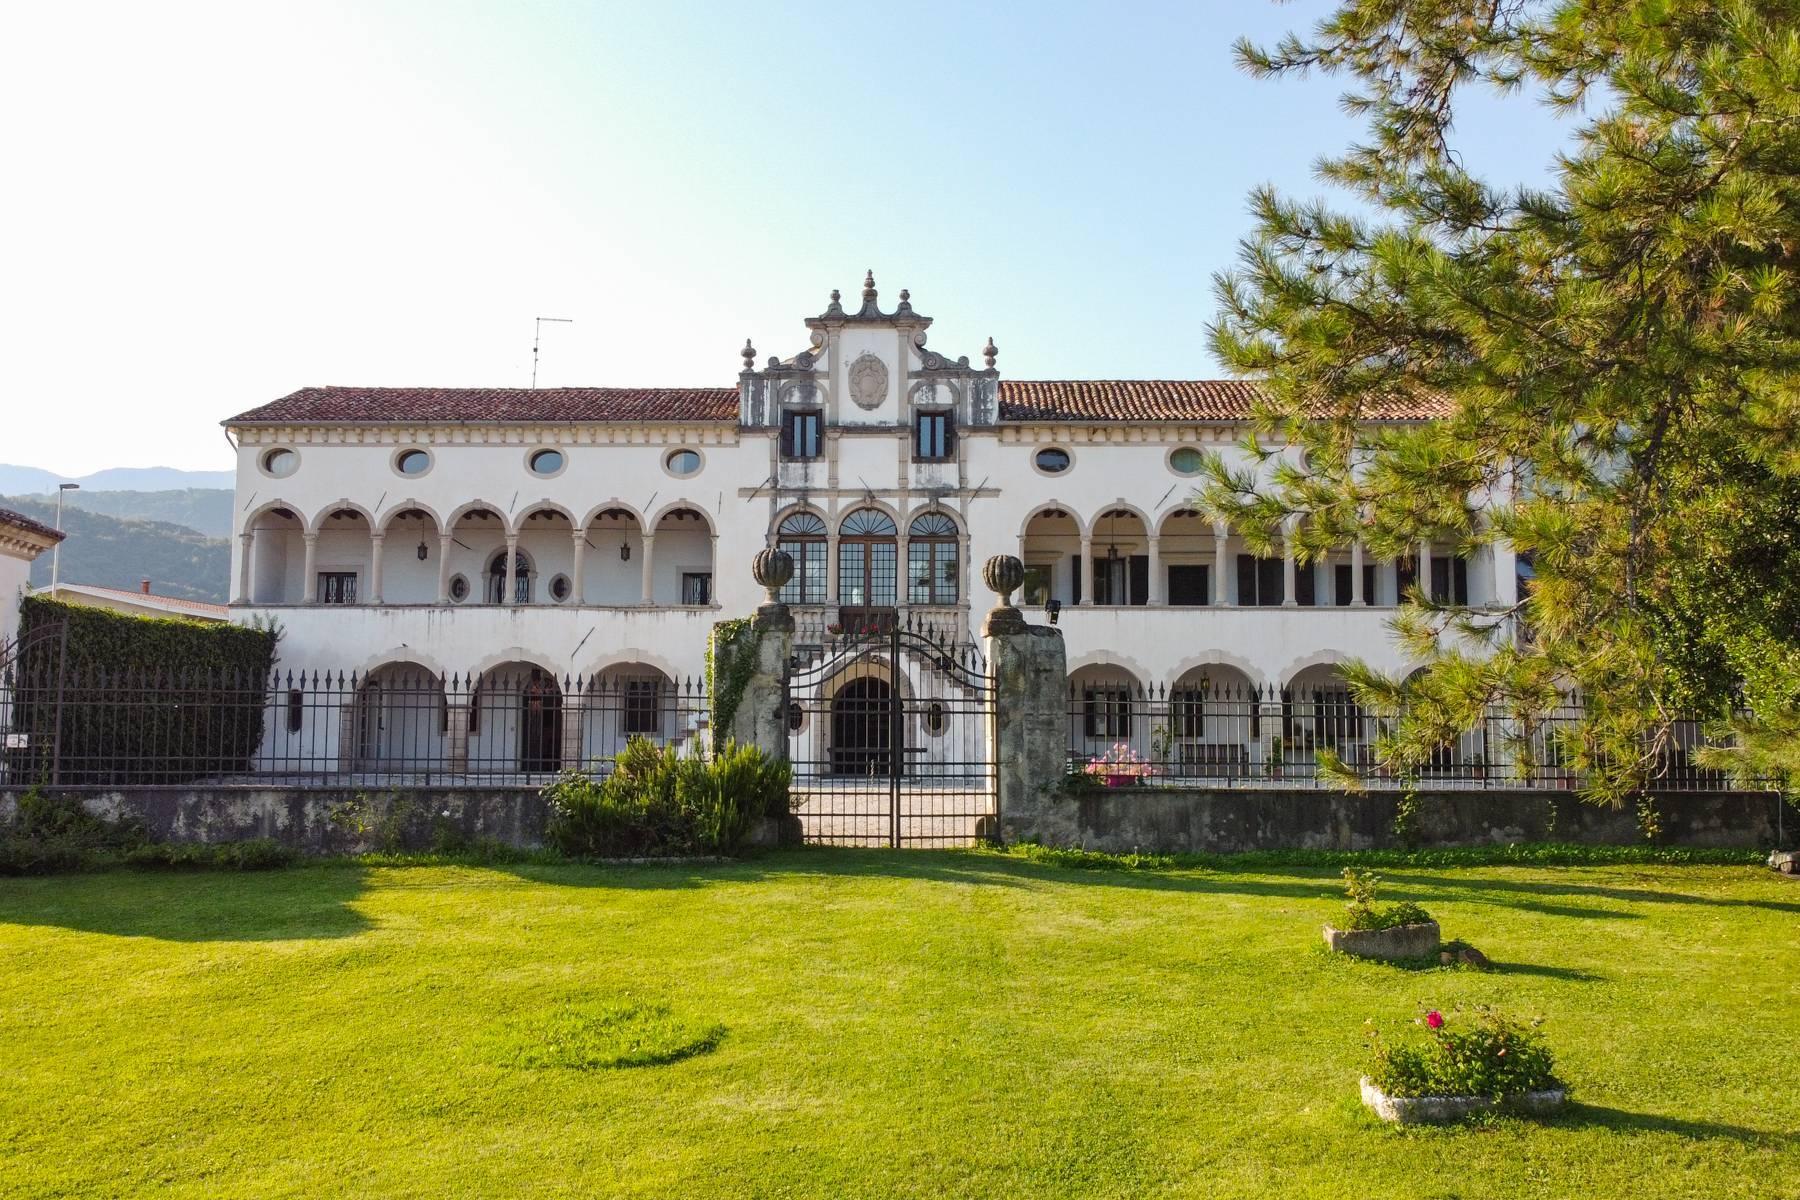 Elegant 17th century Venetian Villa with park on the hills of Treviso - 1